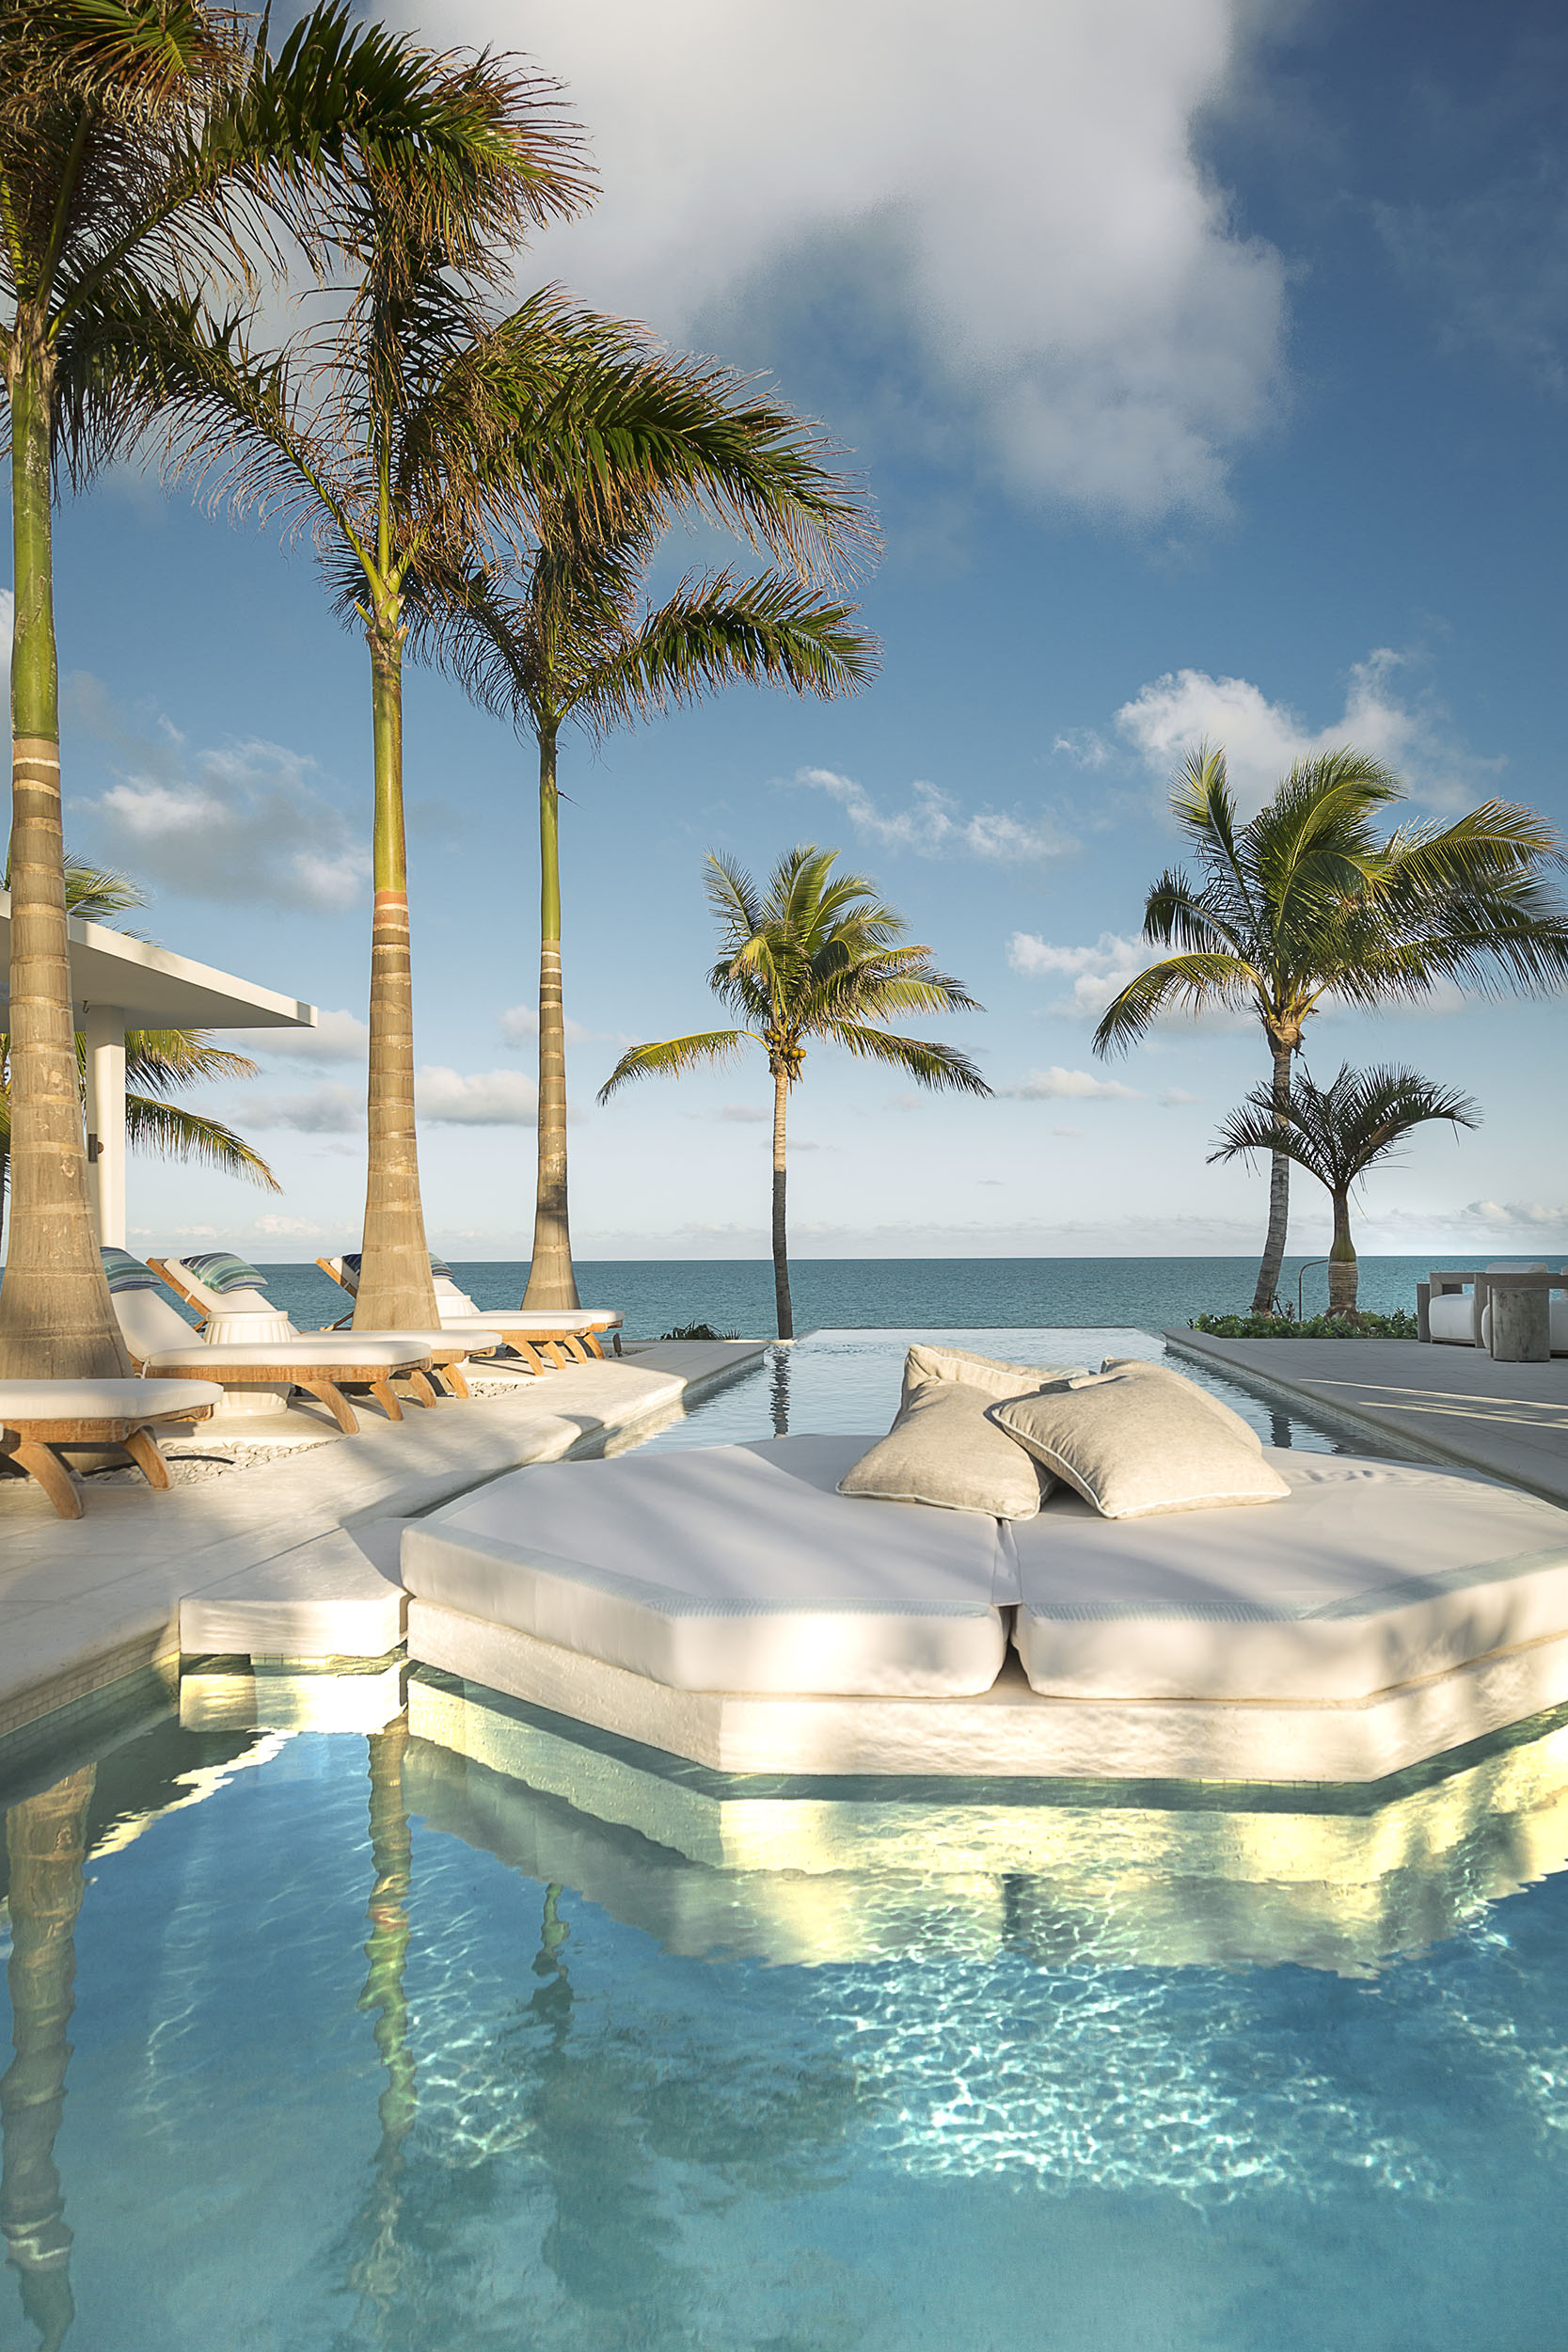 La Dolce Vita - view of the swimming pool